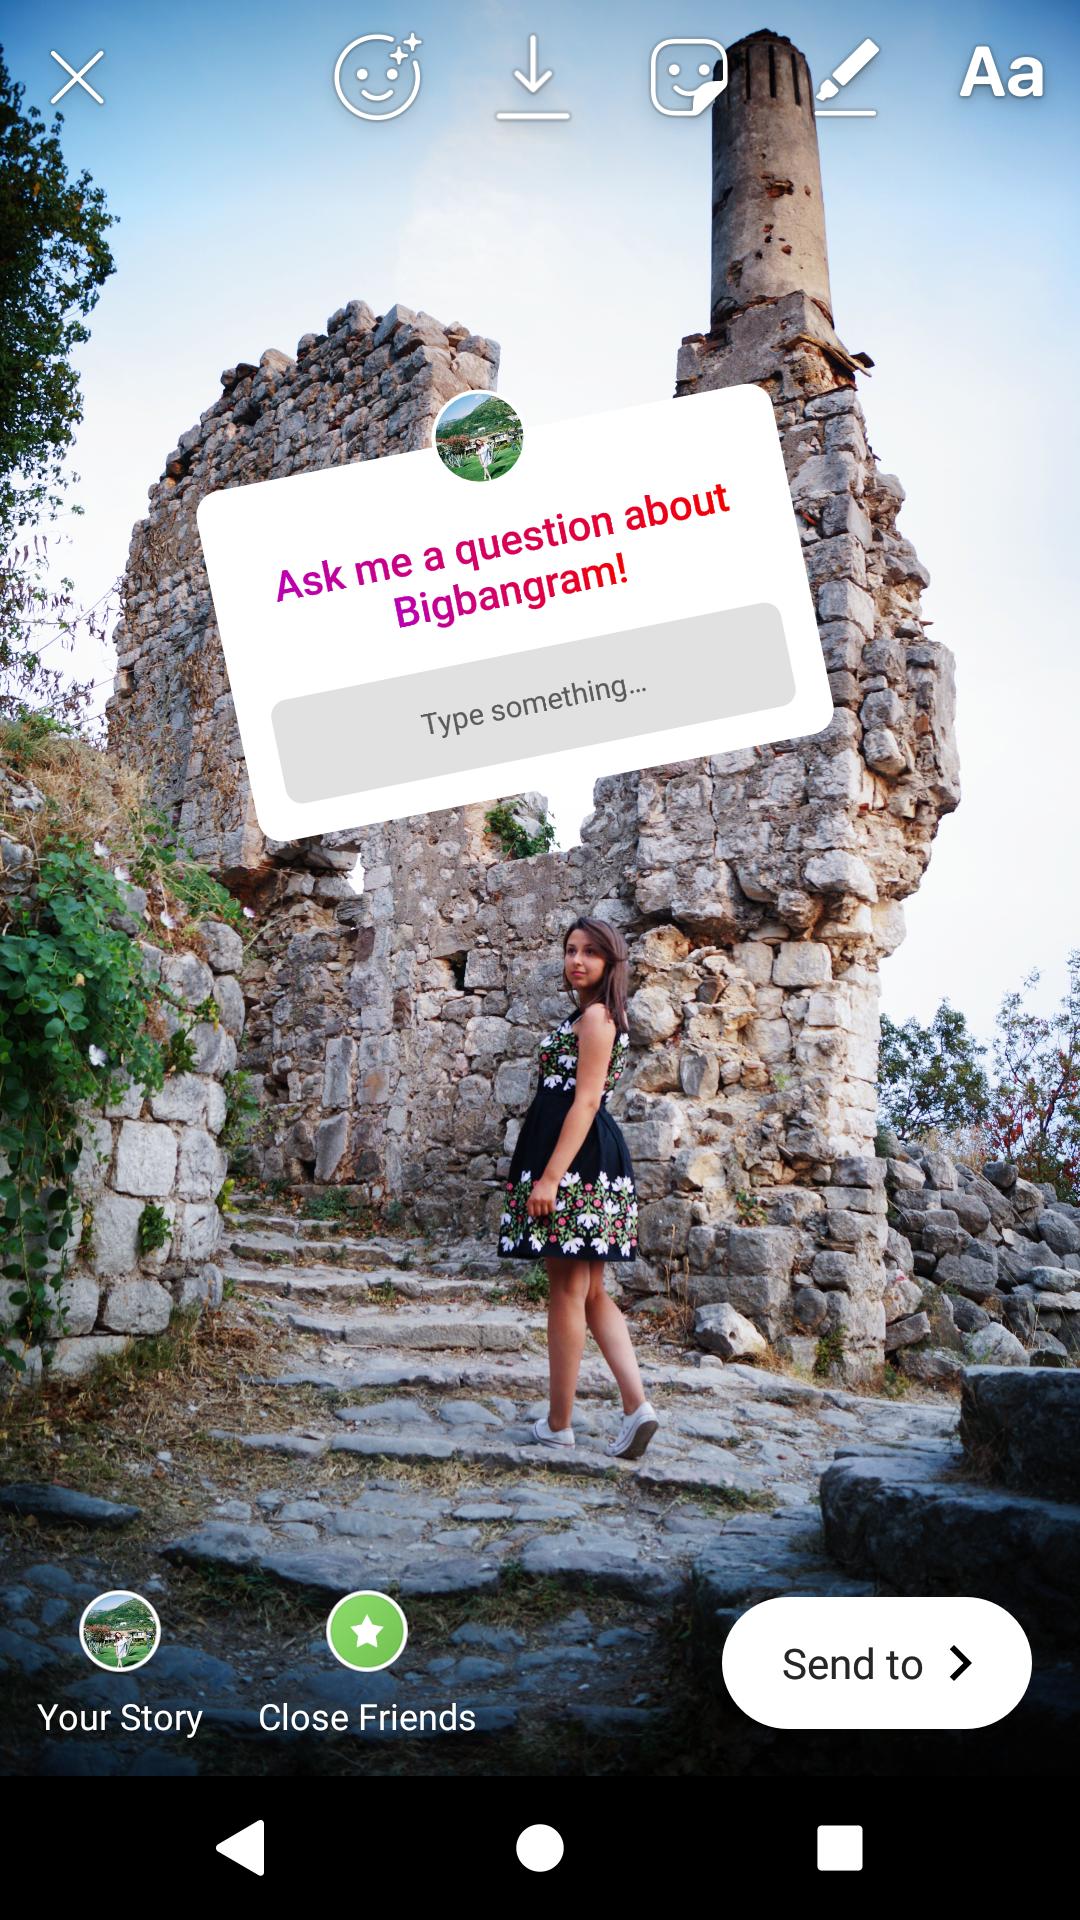 Question about bigbangram